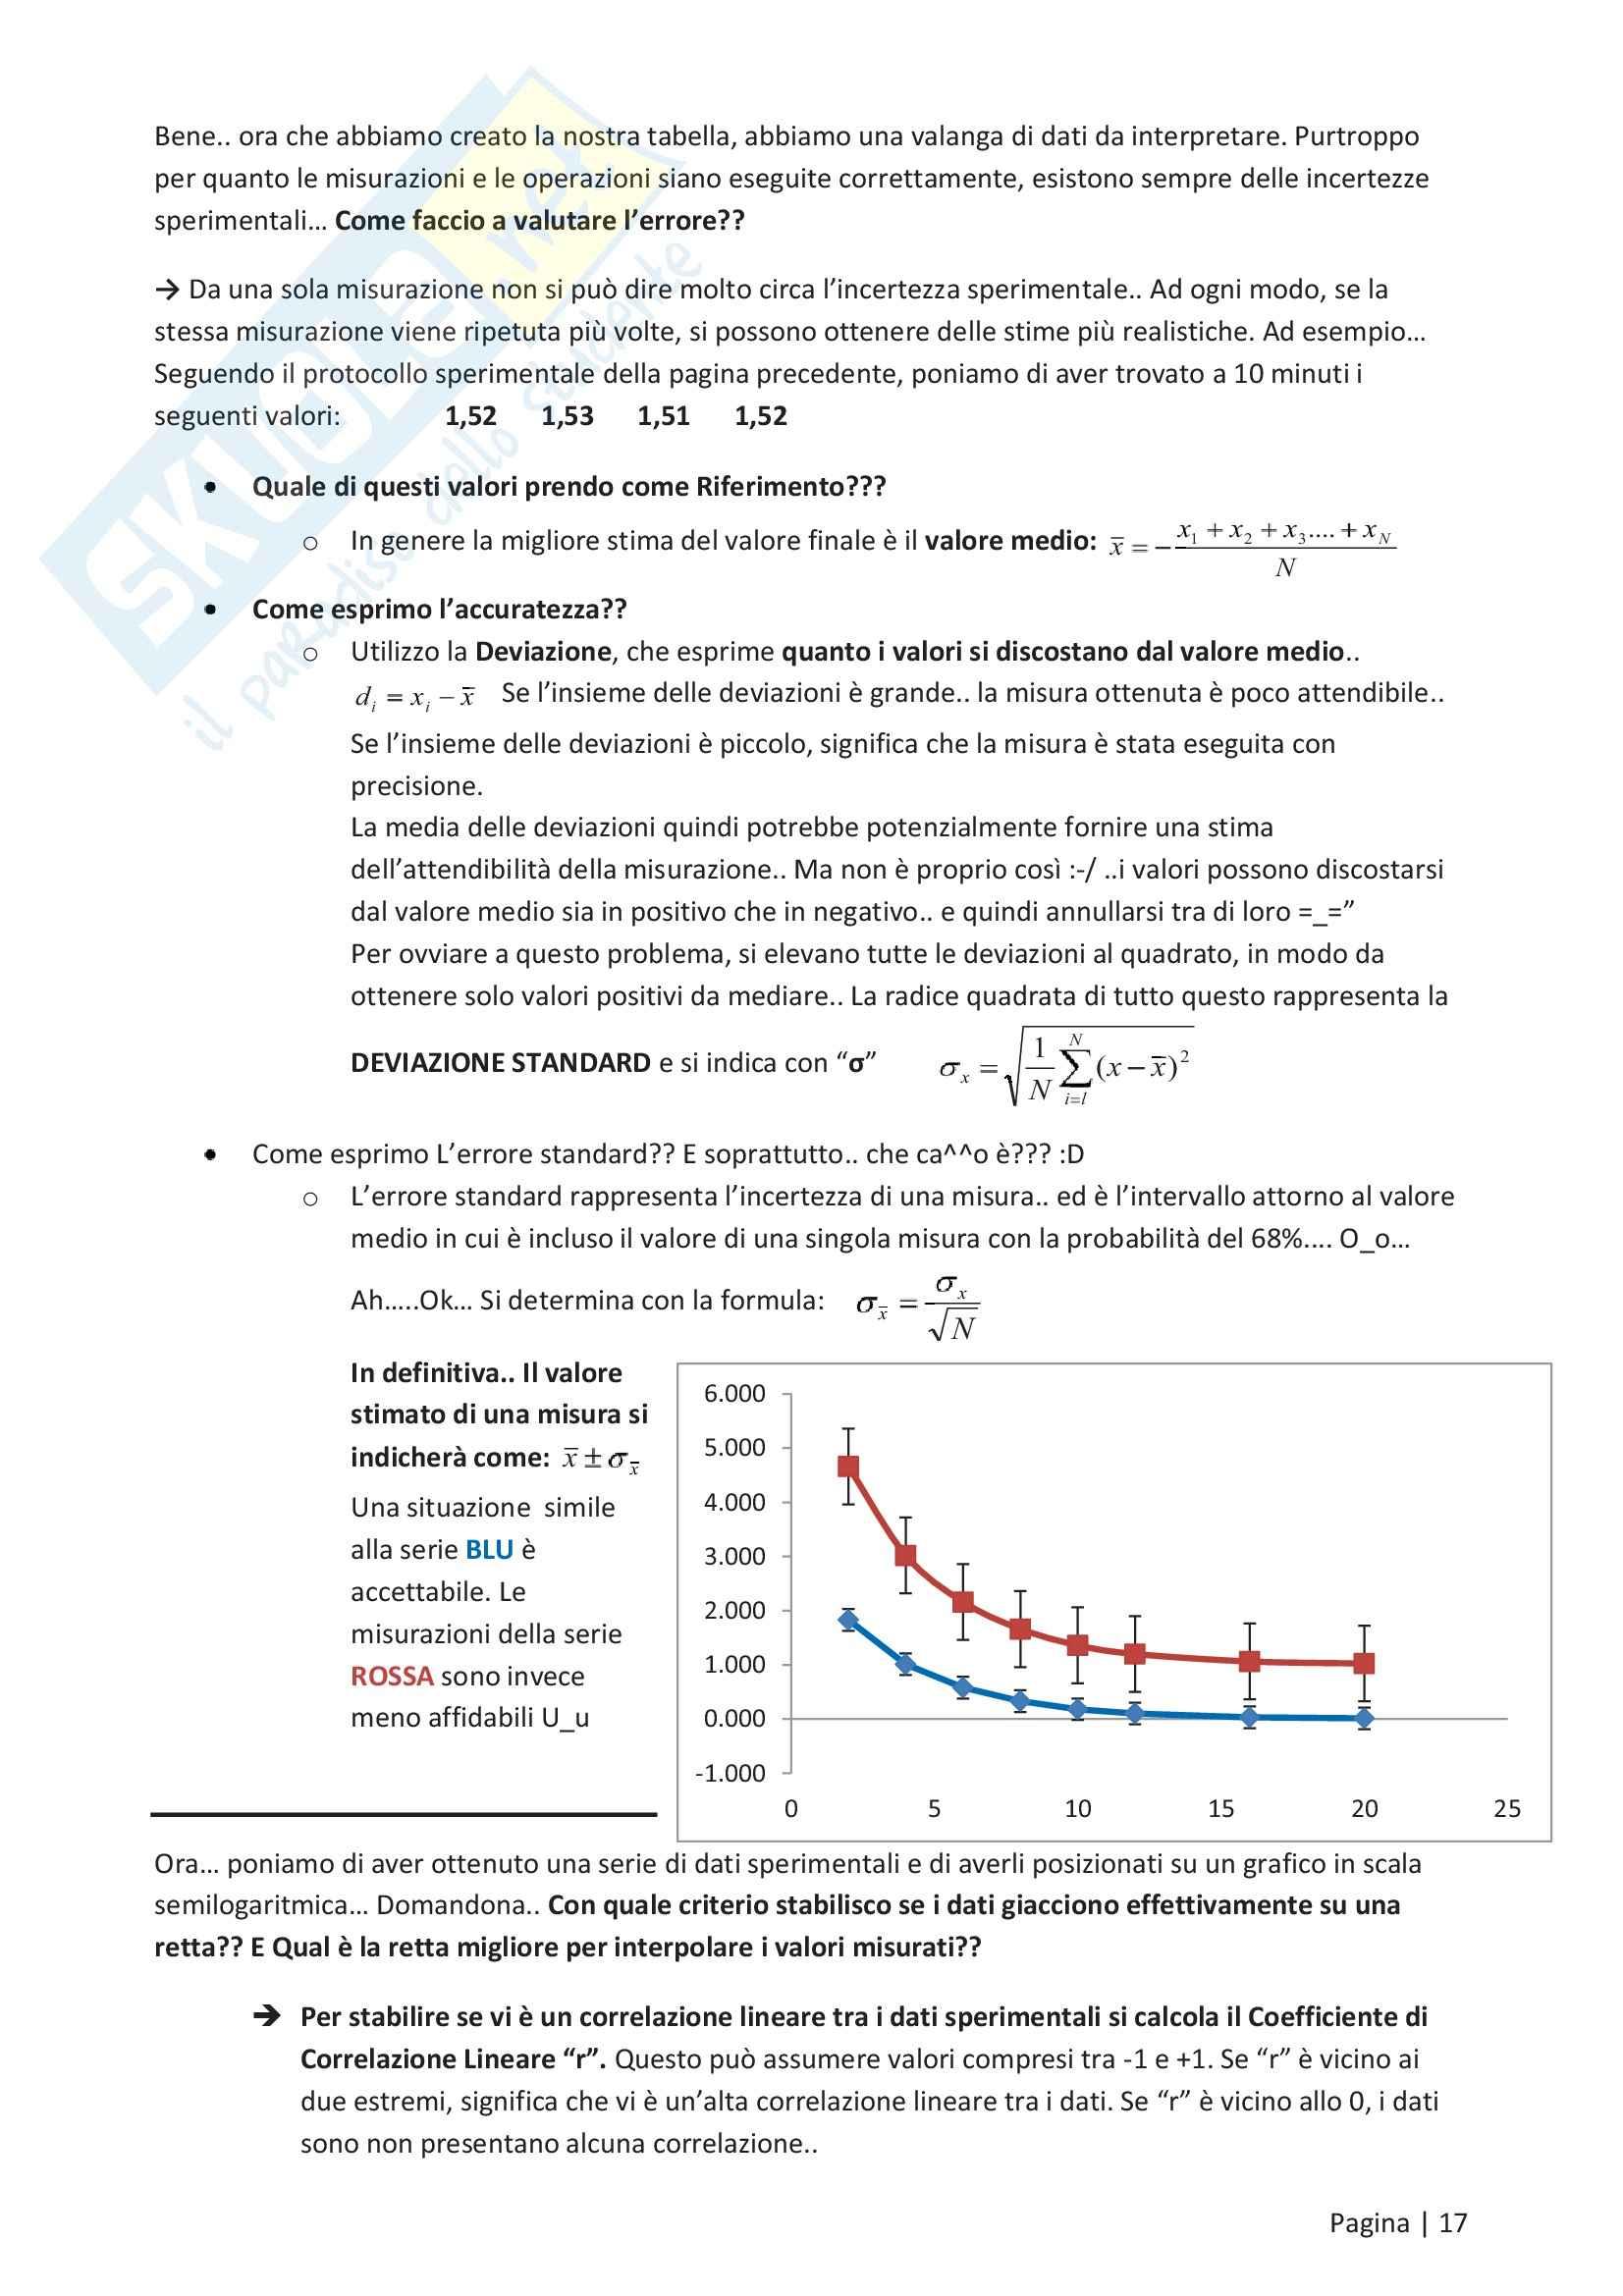 Biofarmaceutica - Appunti Pag. 16